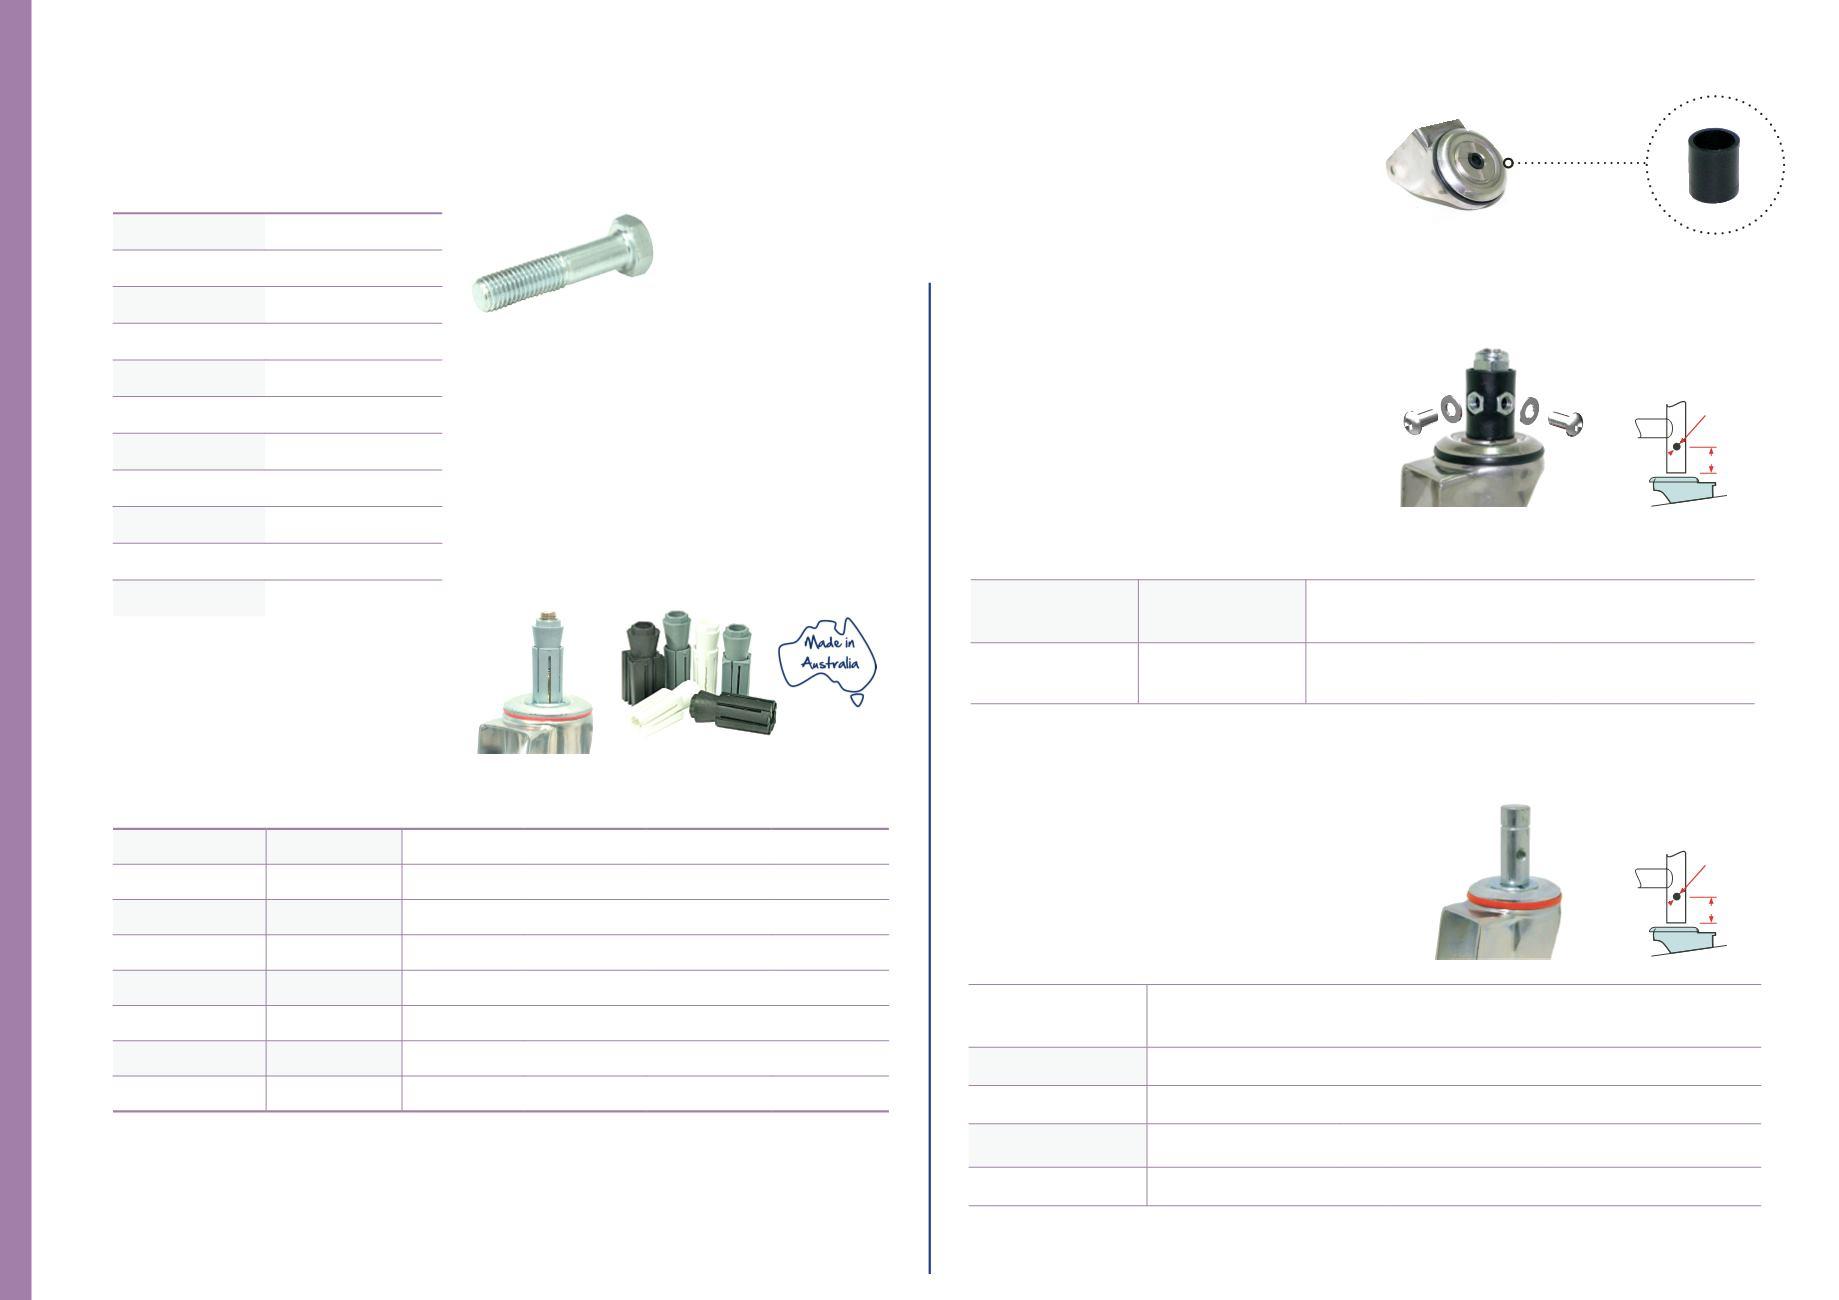 Fallshaw Industrial Catalogue